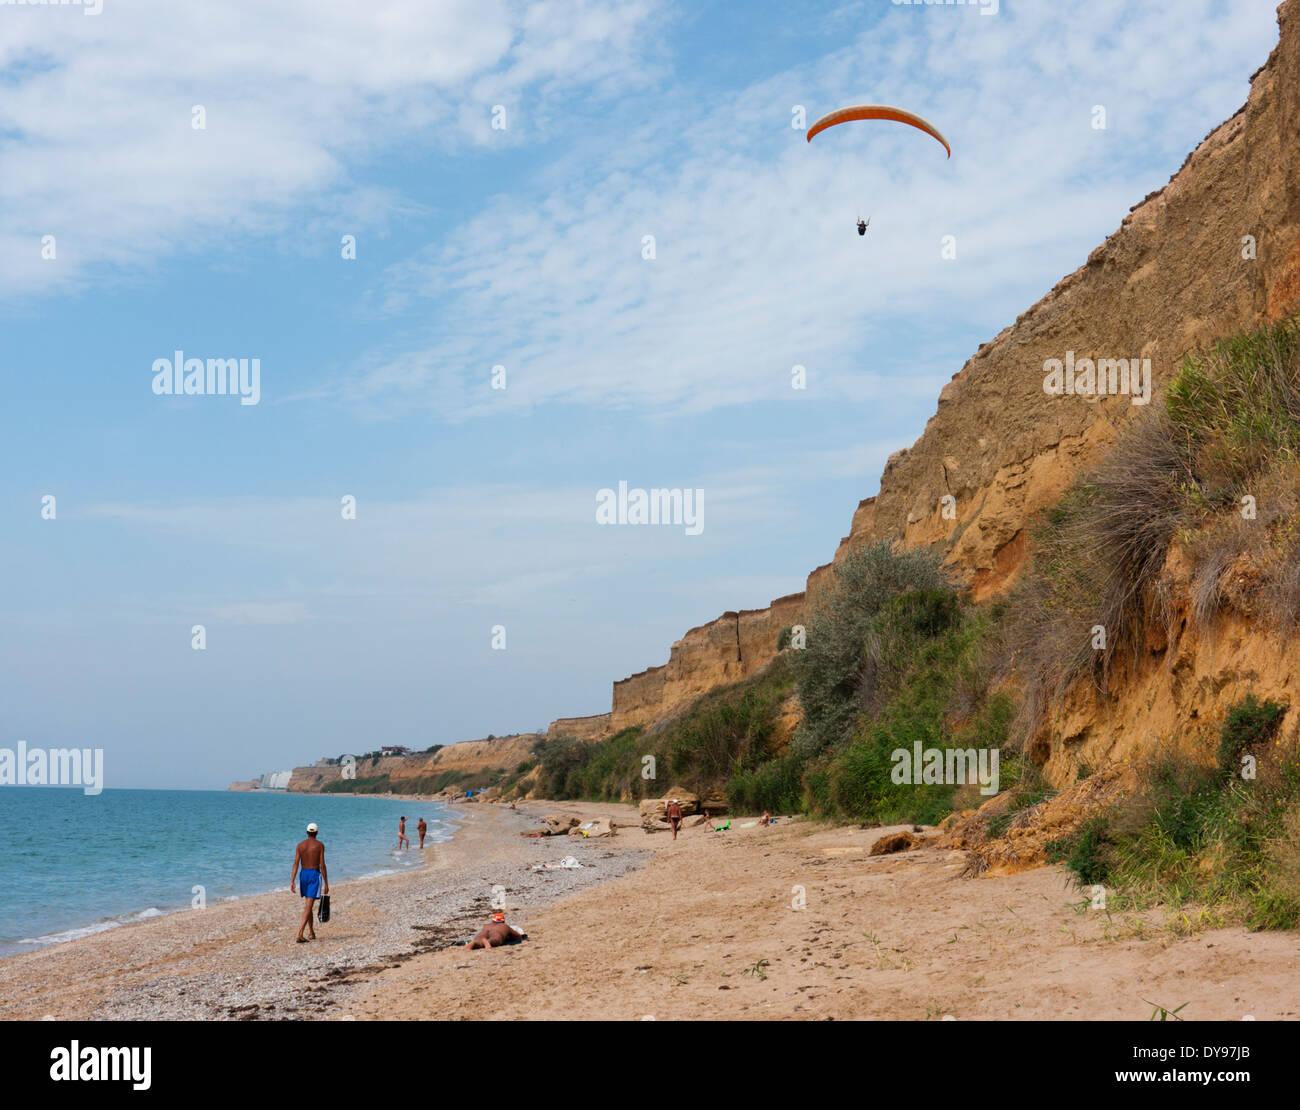 The Black sea coast in Crimea Ukraine - Stock Image